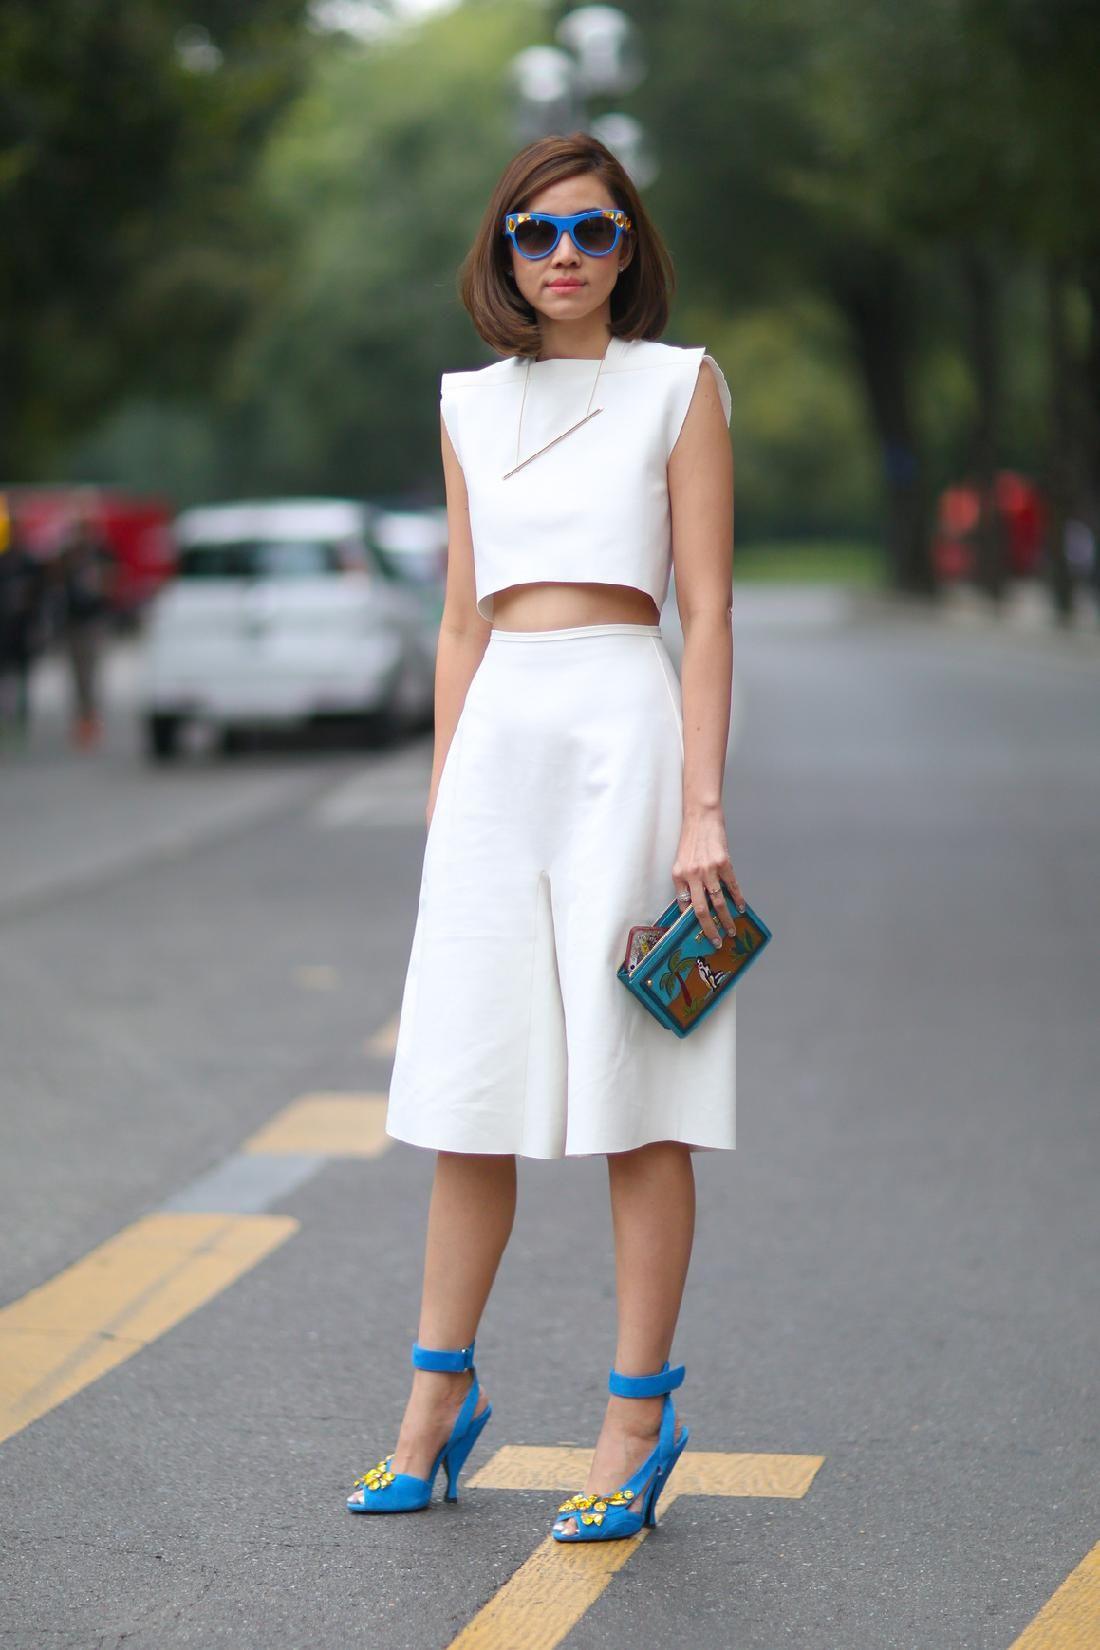 497ea9adc21e Attendees at Milan Fashion Week Spring 2015 - Street Fashion